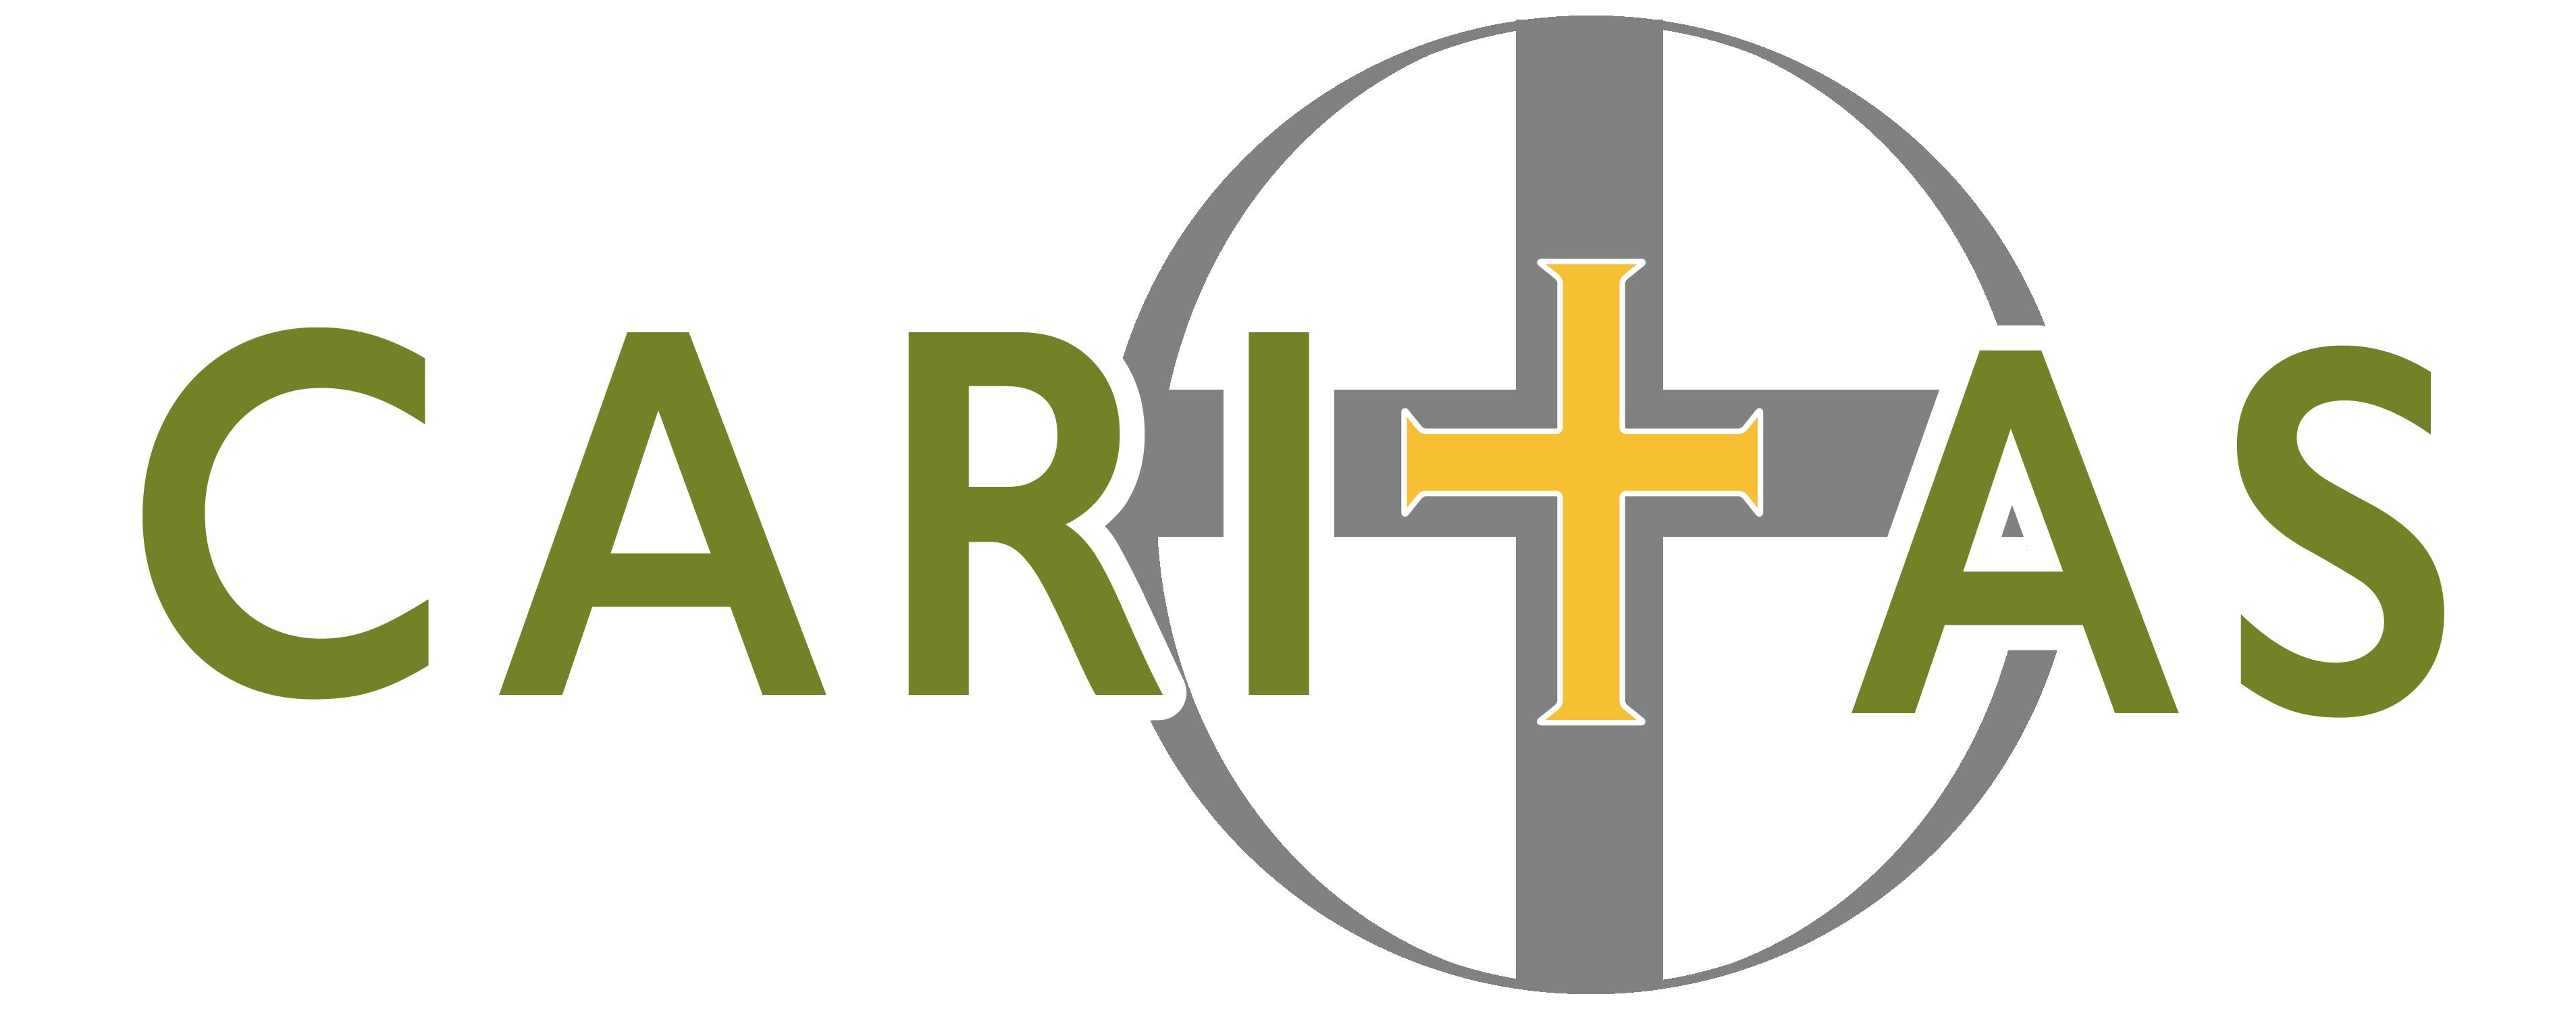 Caritas Community Charitable Trust LBG